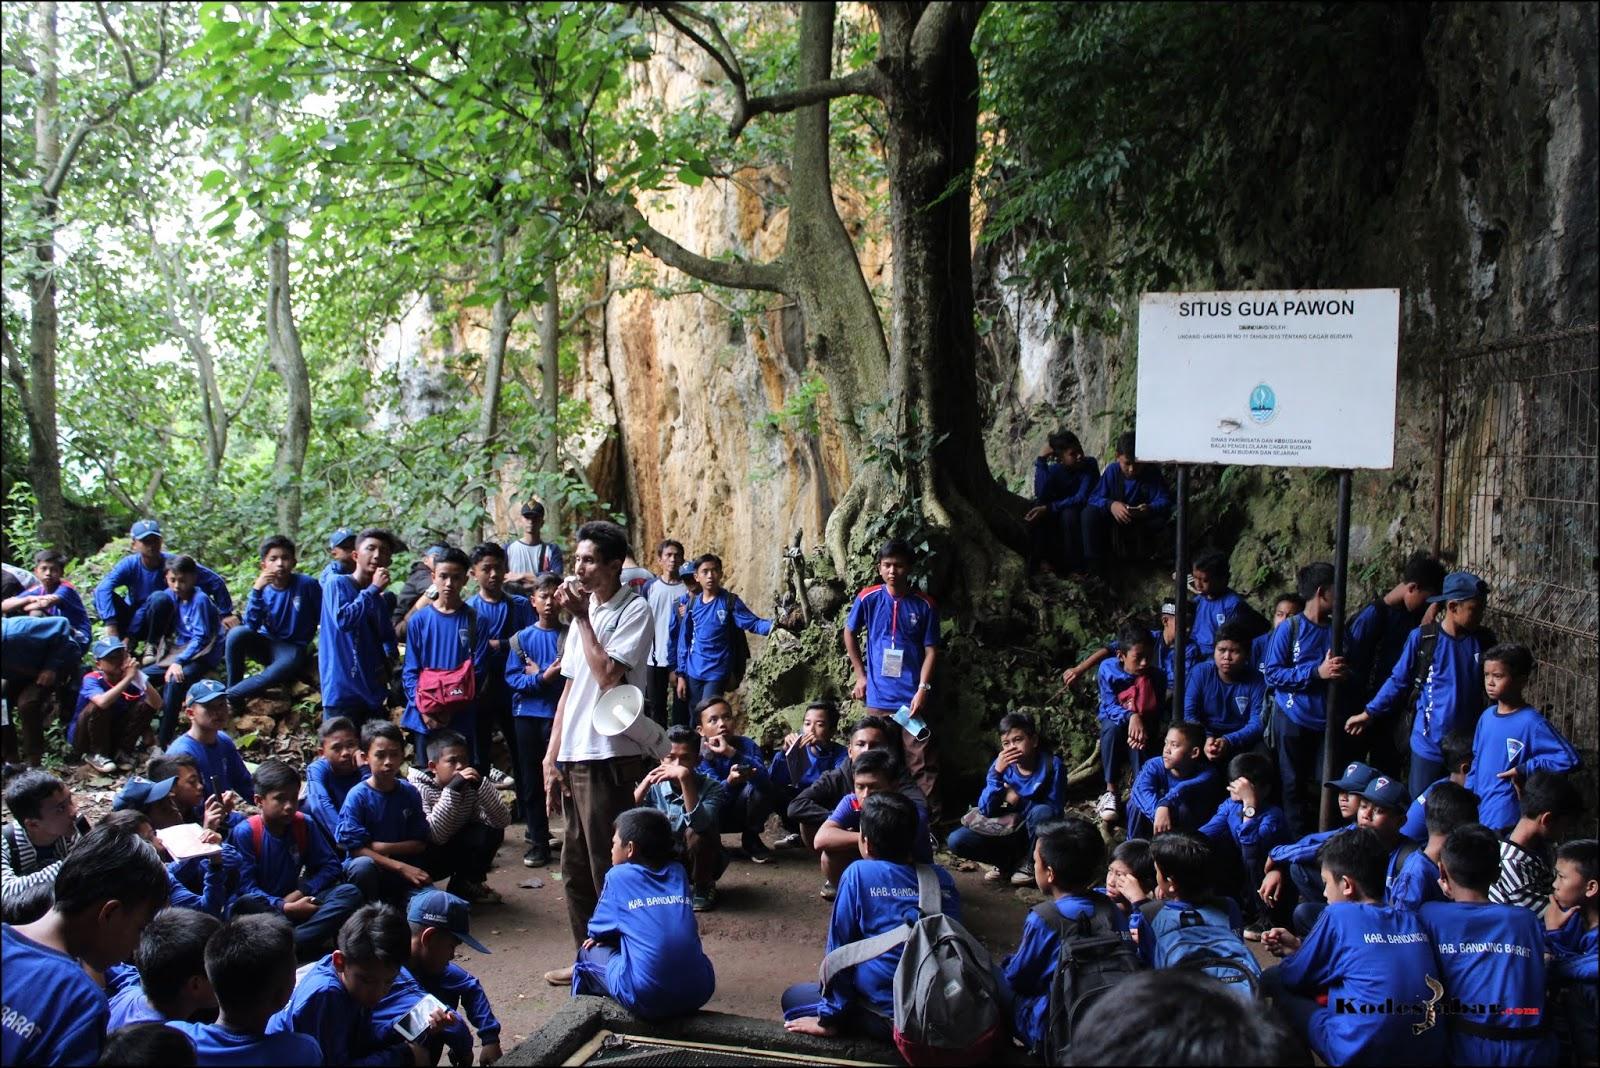 Siswa Kelas 7 SMPN 2 Cipatat Belajar Sejarah Manusia Purba di Guha Pawon